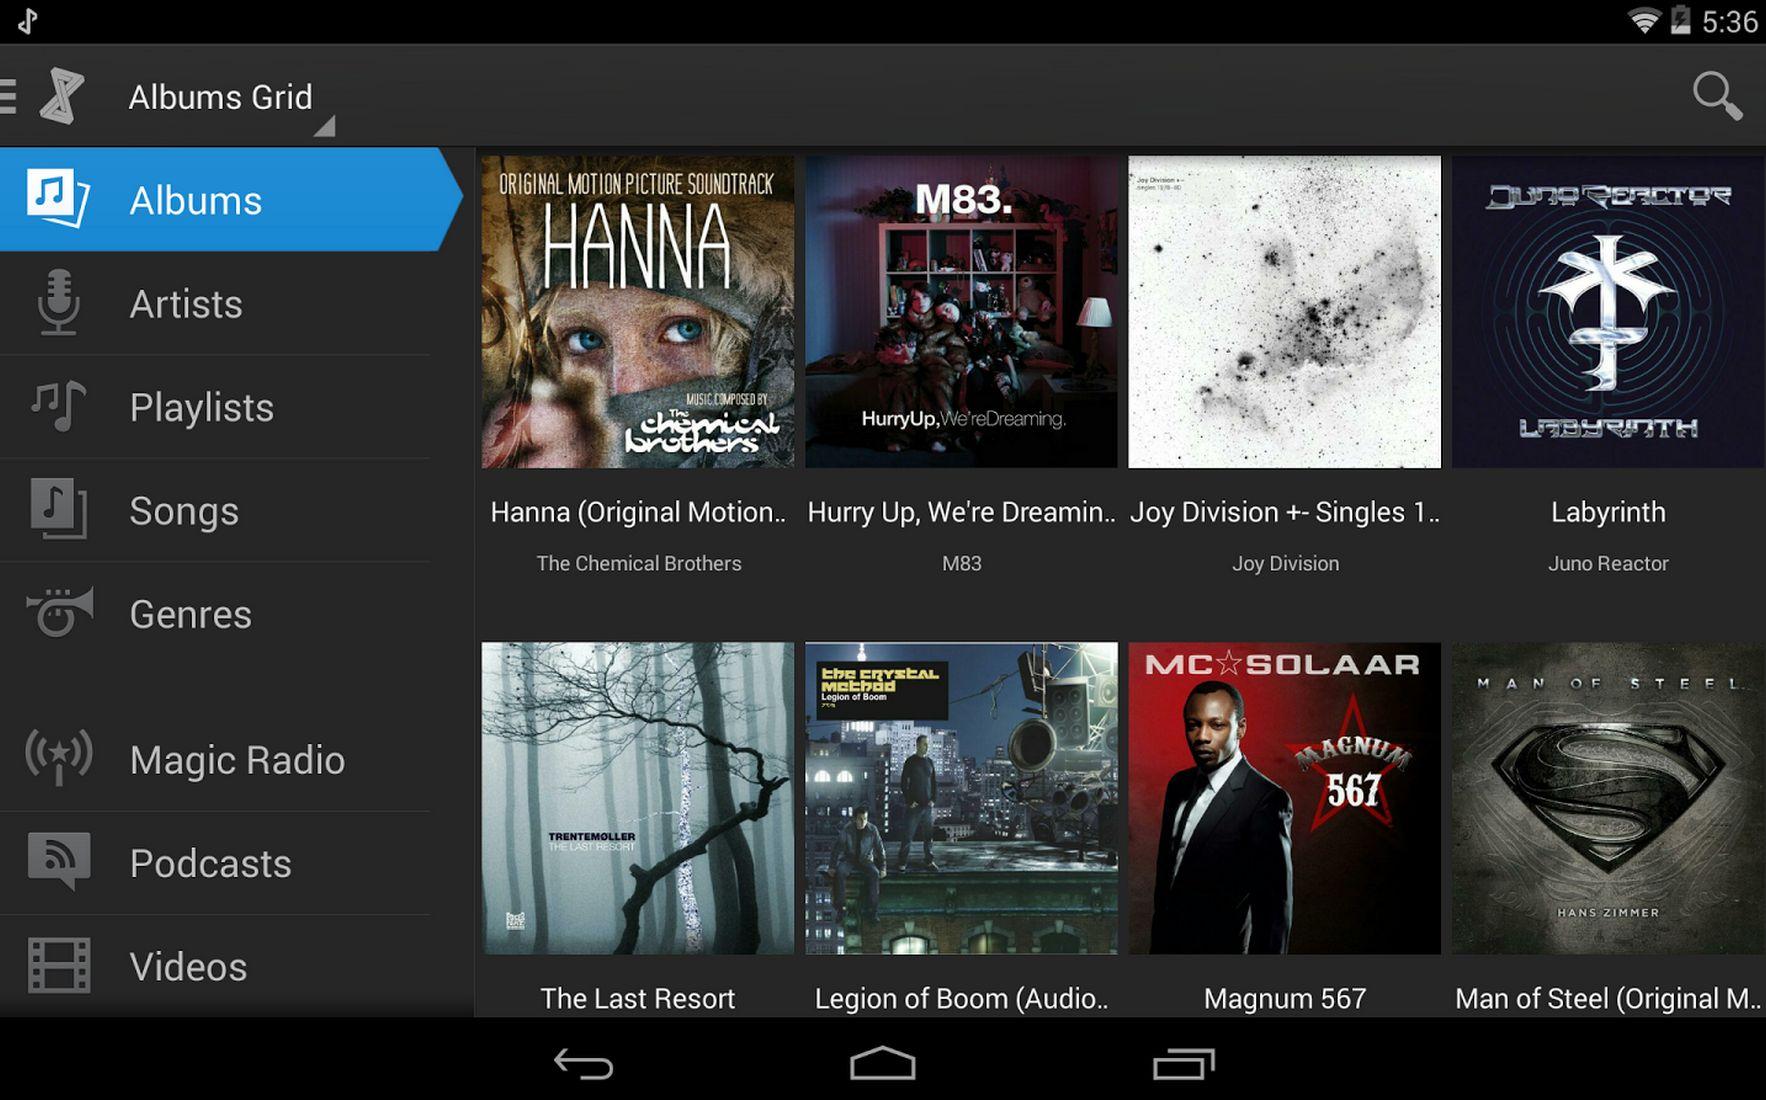 doubletwist tablet albums